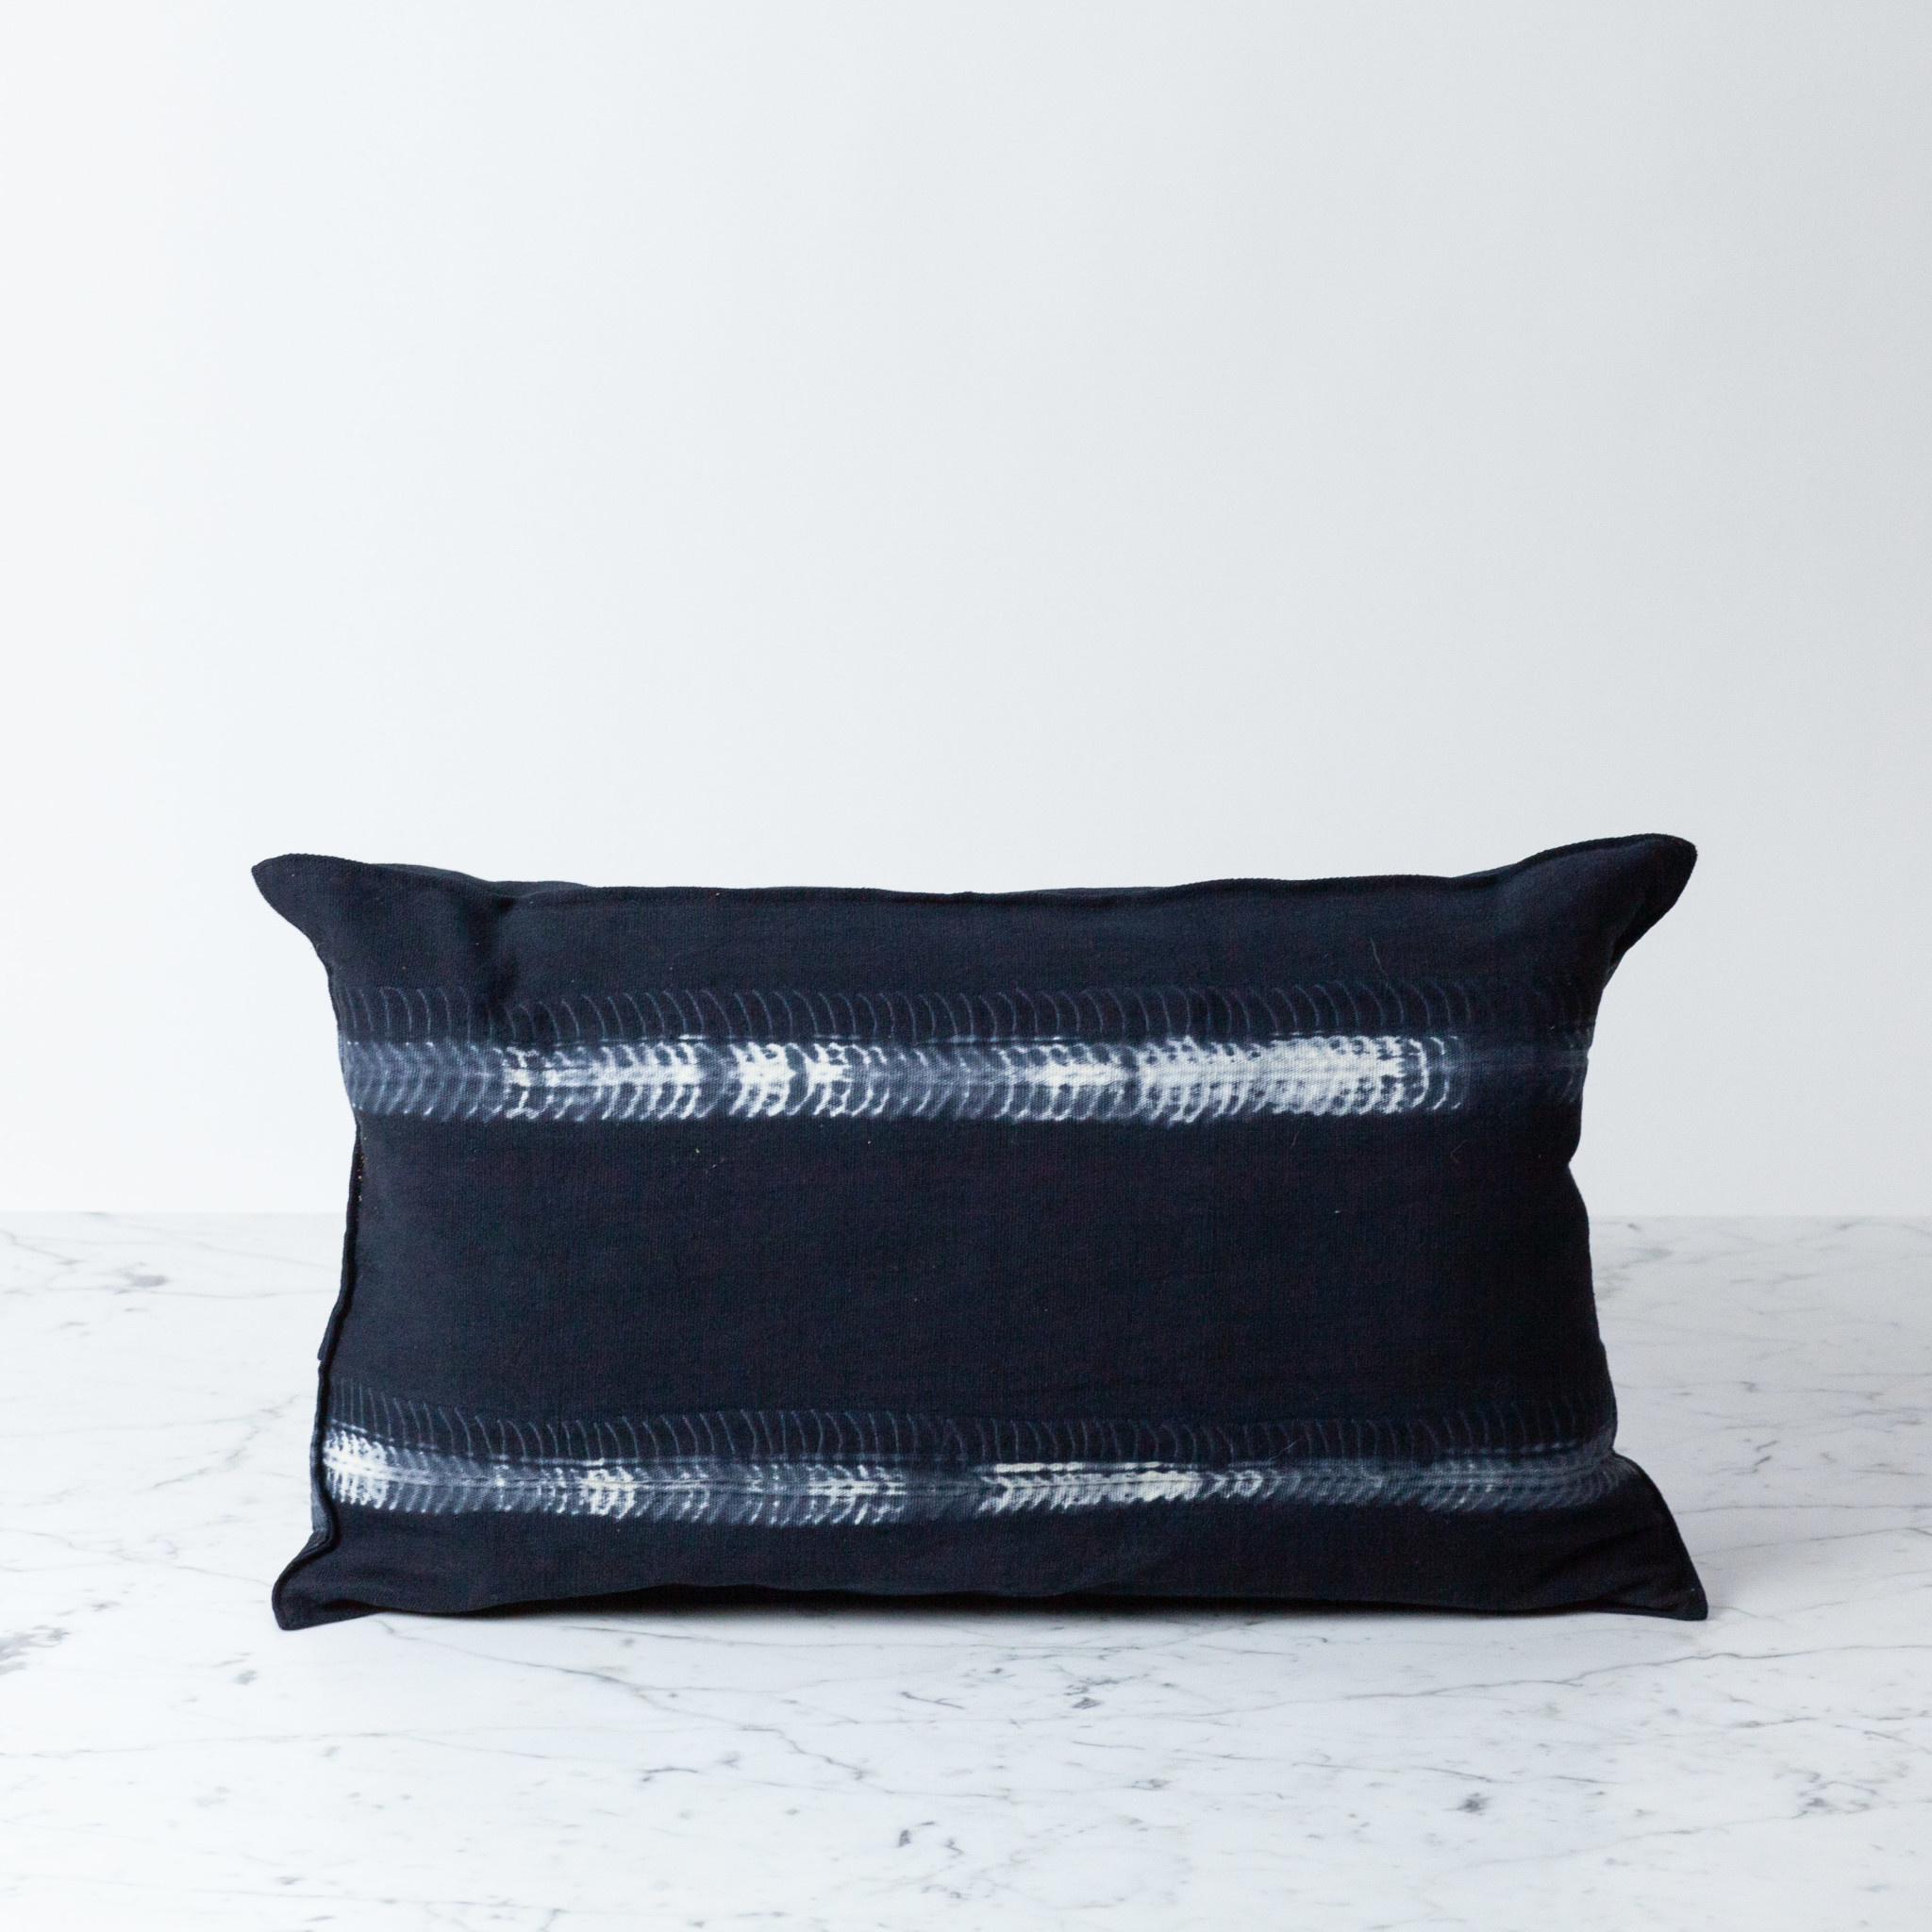 "TENSIRA 12 x 20"" Handwoven Cotton Pillow with Down Insert - Button Closure - Black Fish Bone Stitch Dye Stripes"